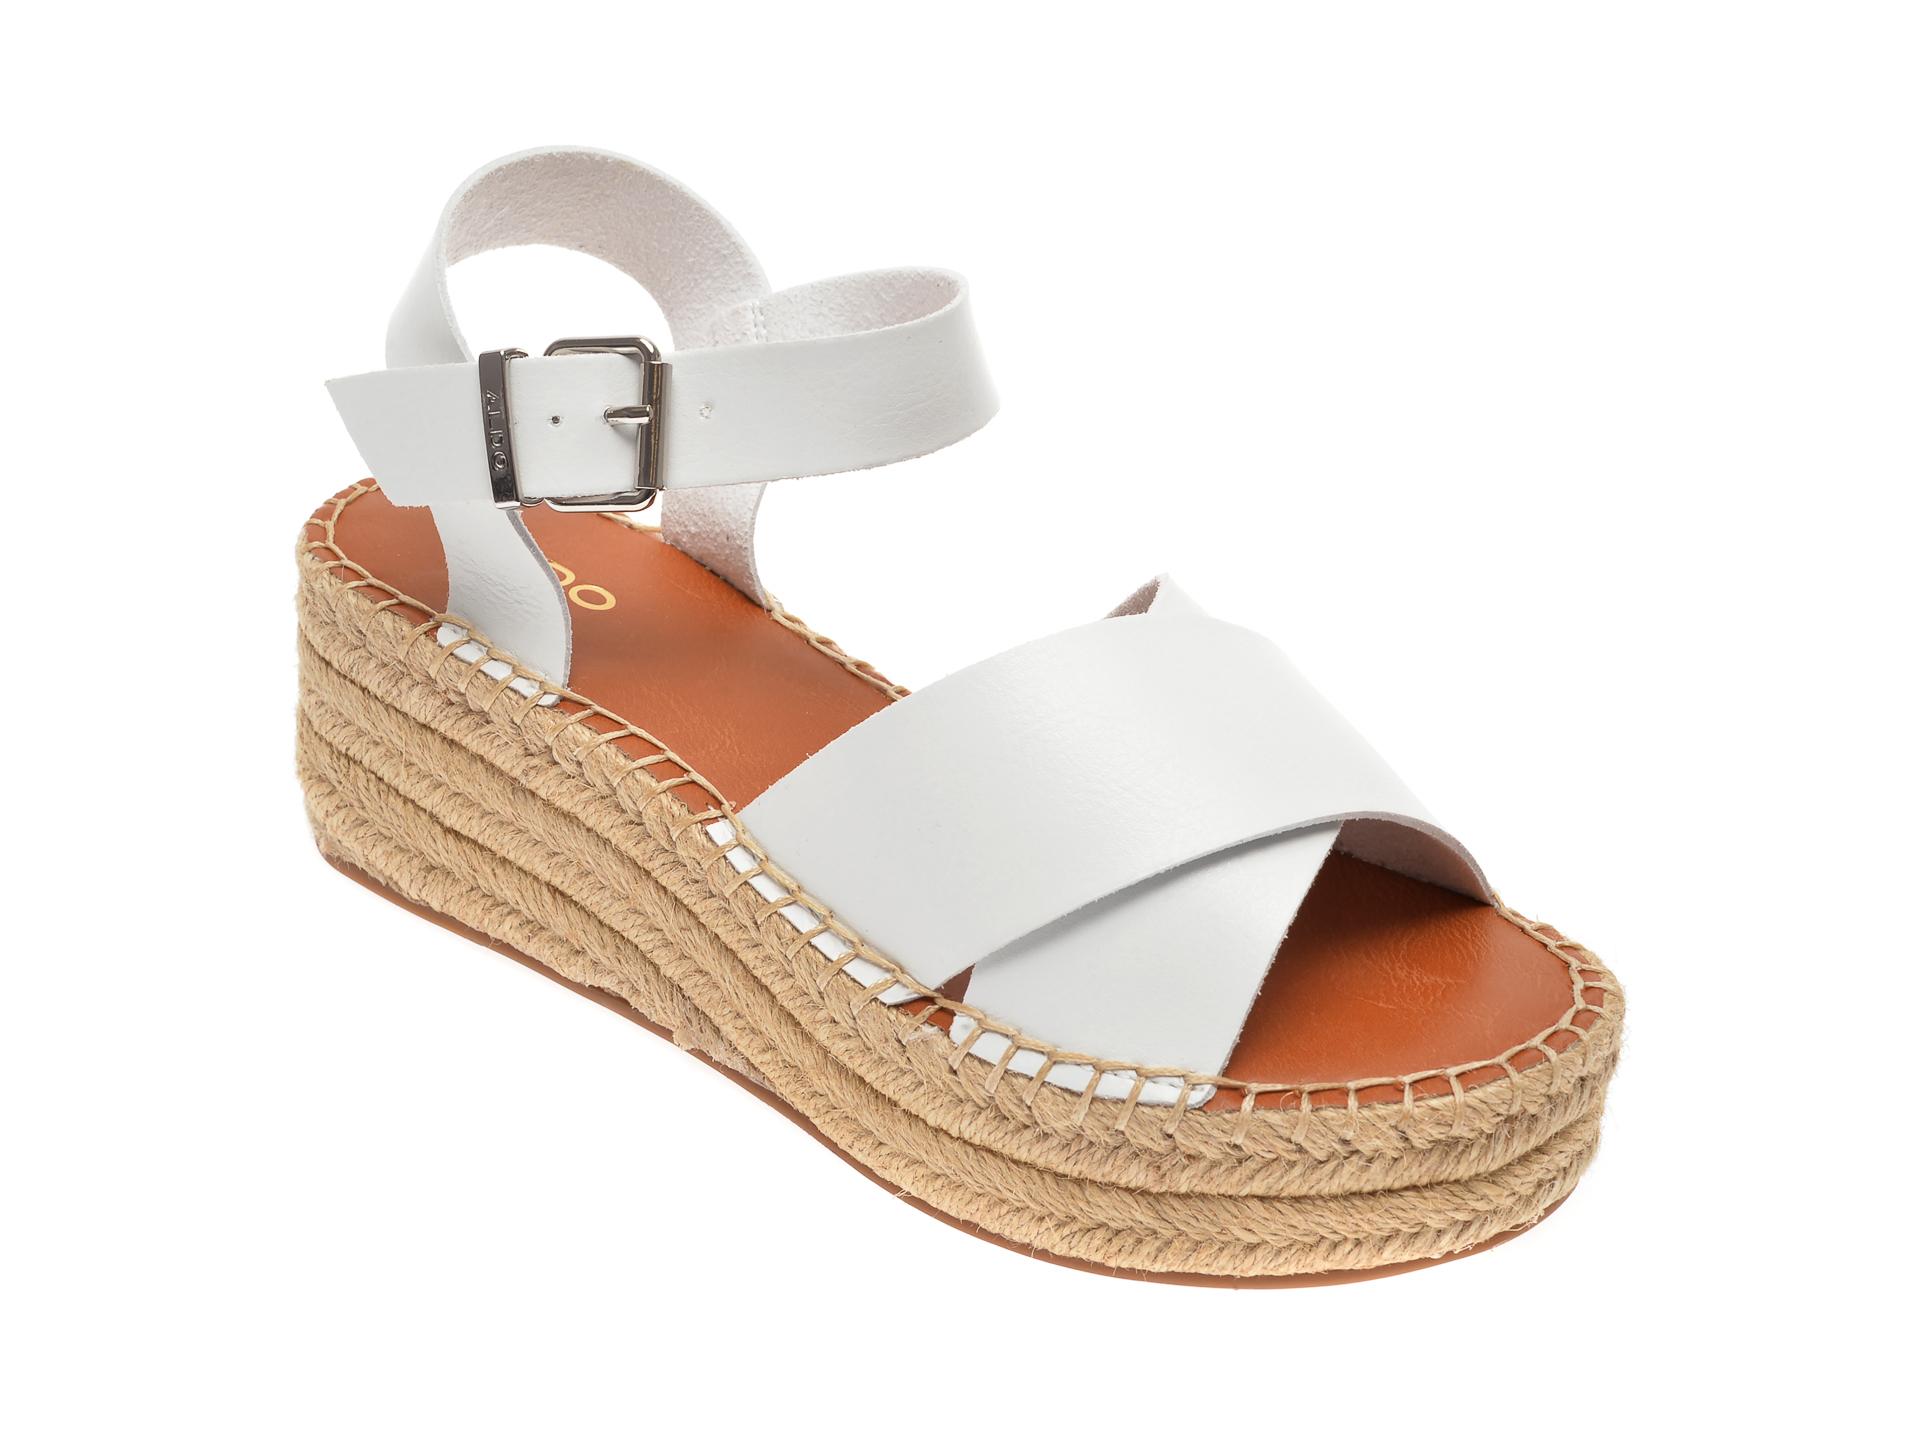 Sandale ALDO albe, Tineviel100, din piele ecologica